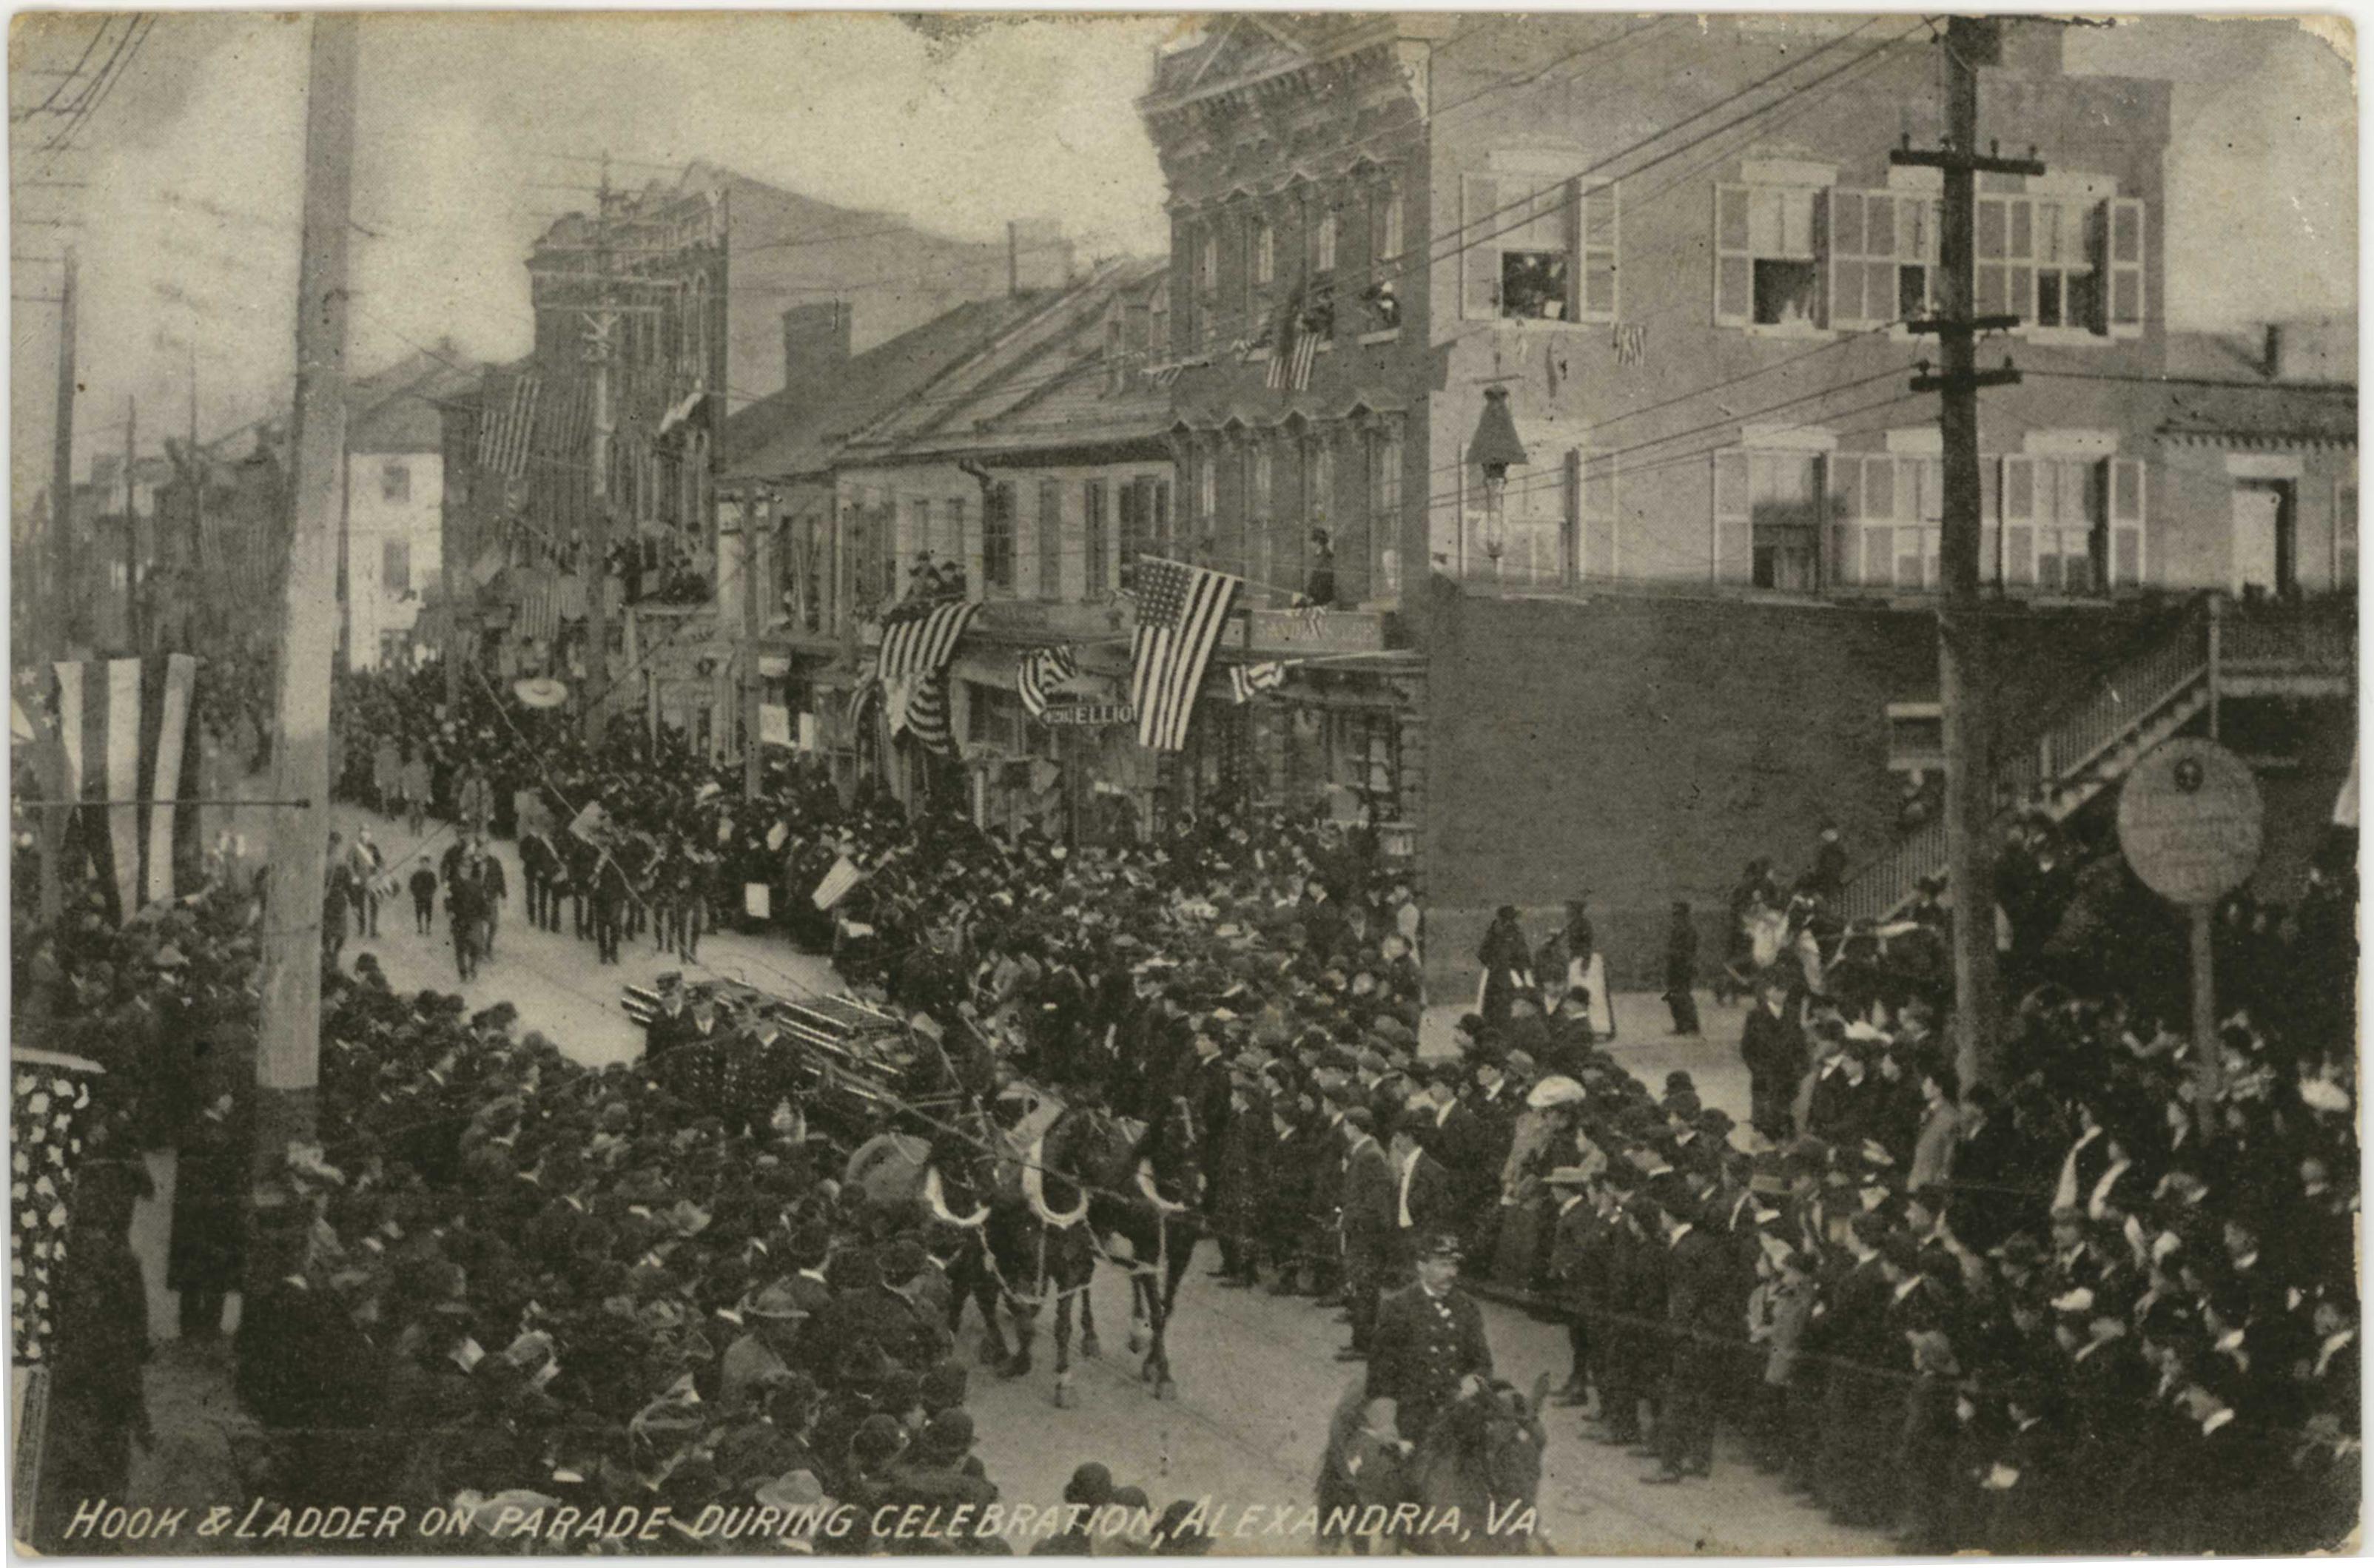 alexandria virginia hook and ladder parade 1909